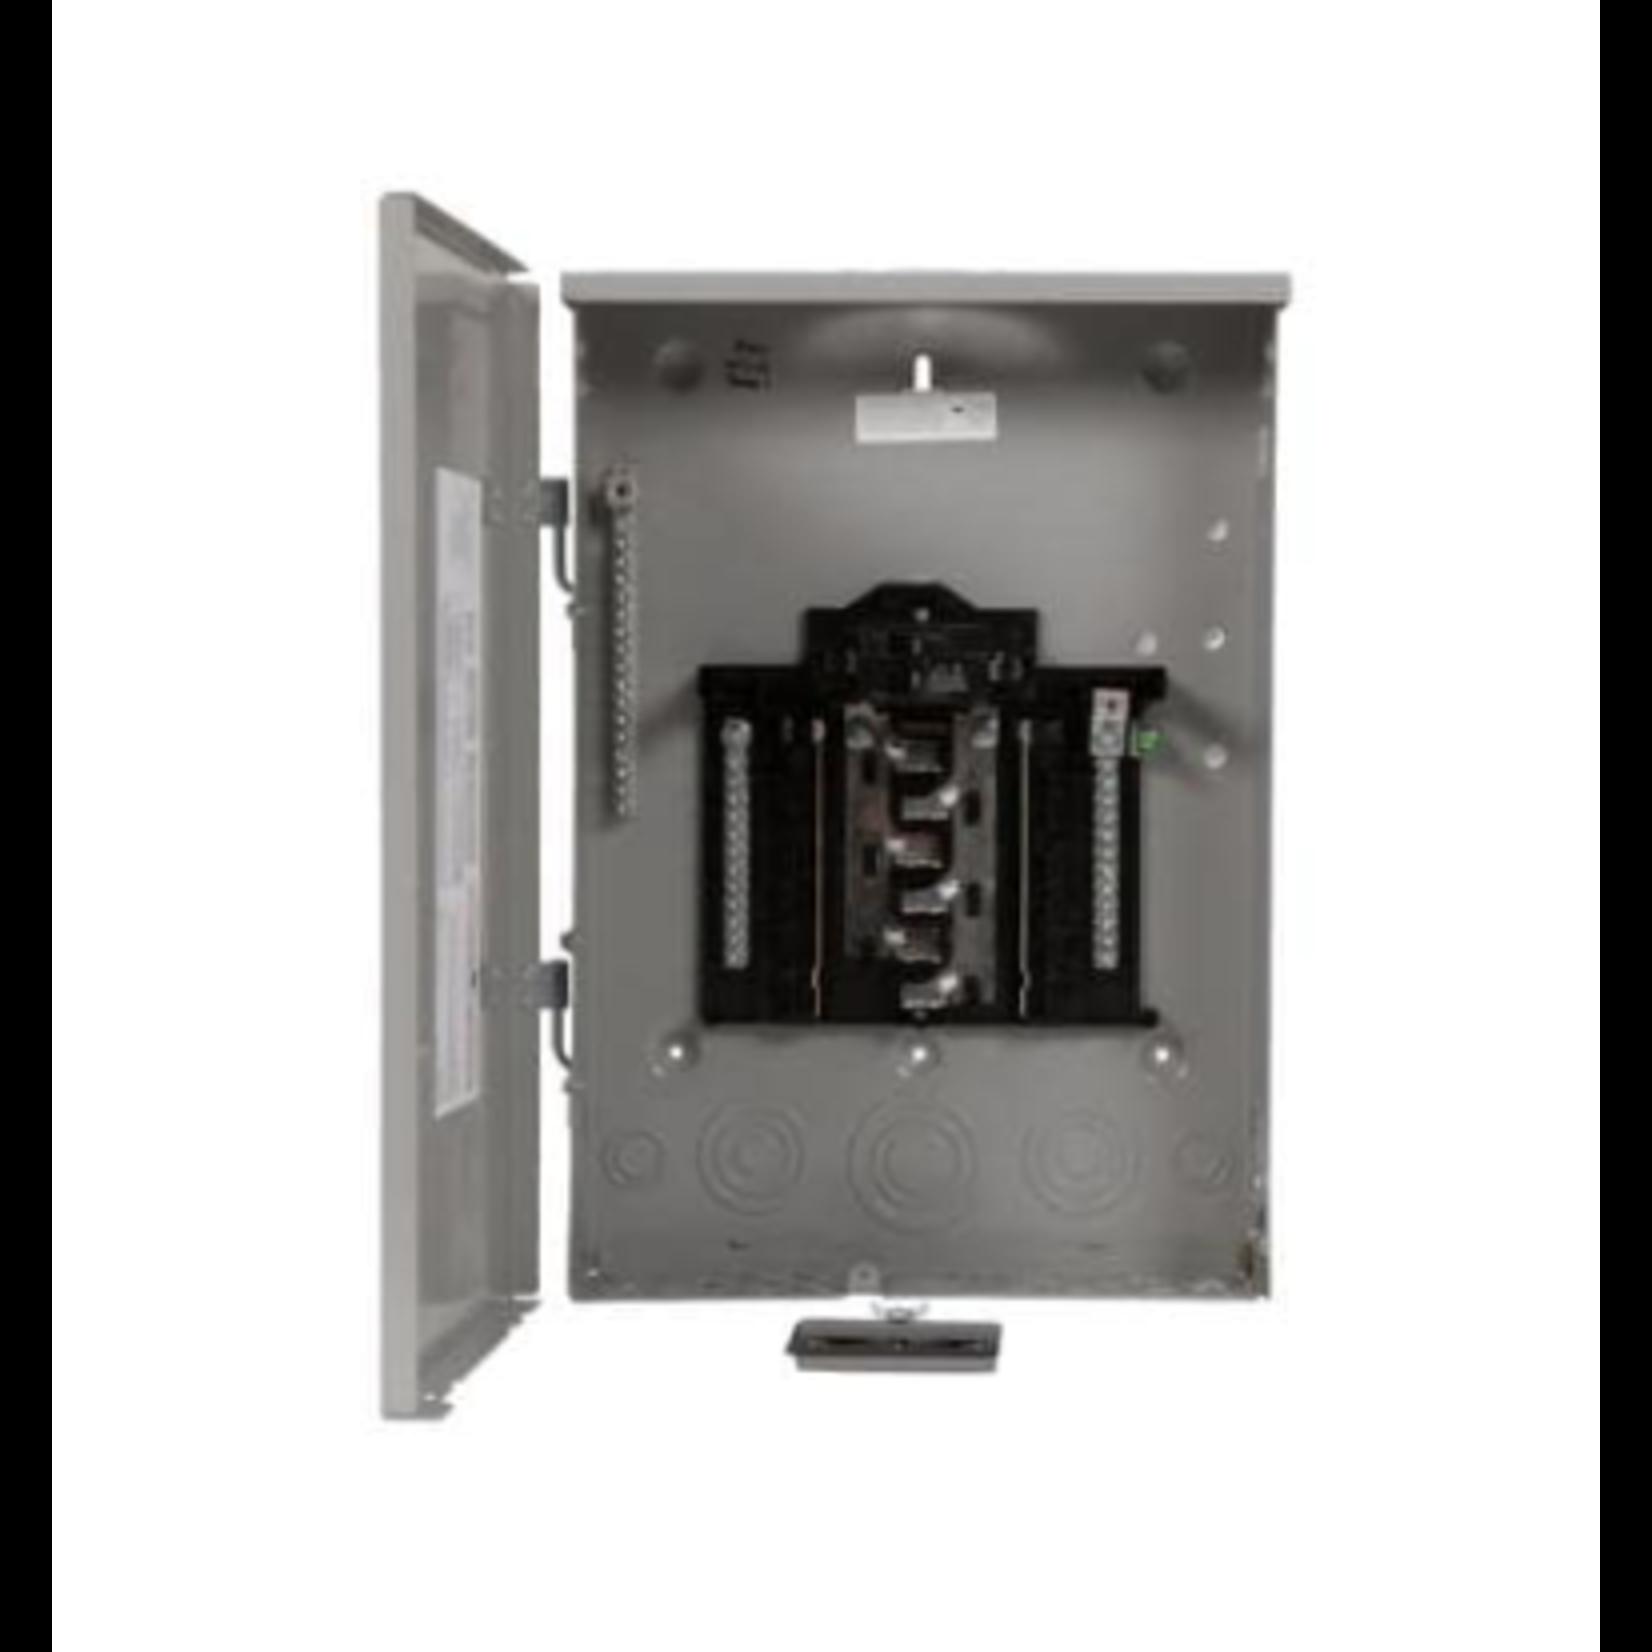 10442 Siemens Outdoor Load System